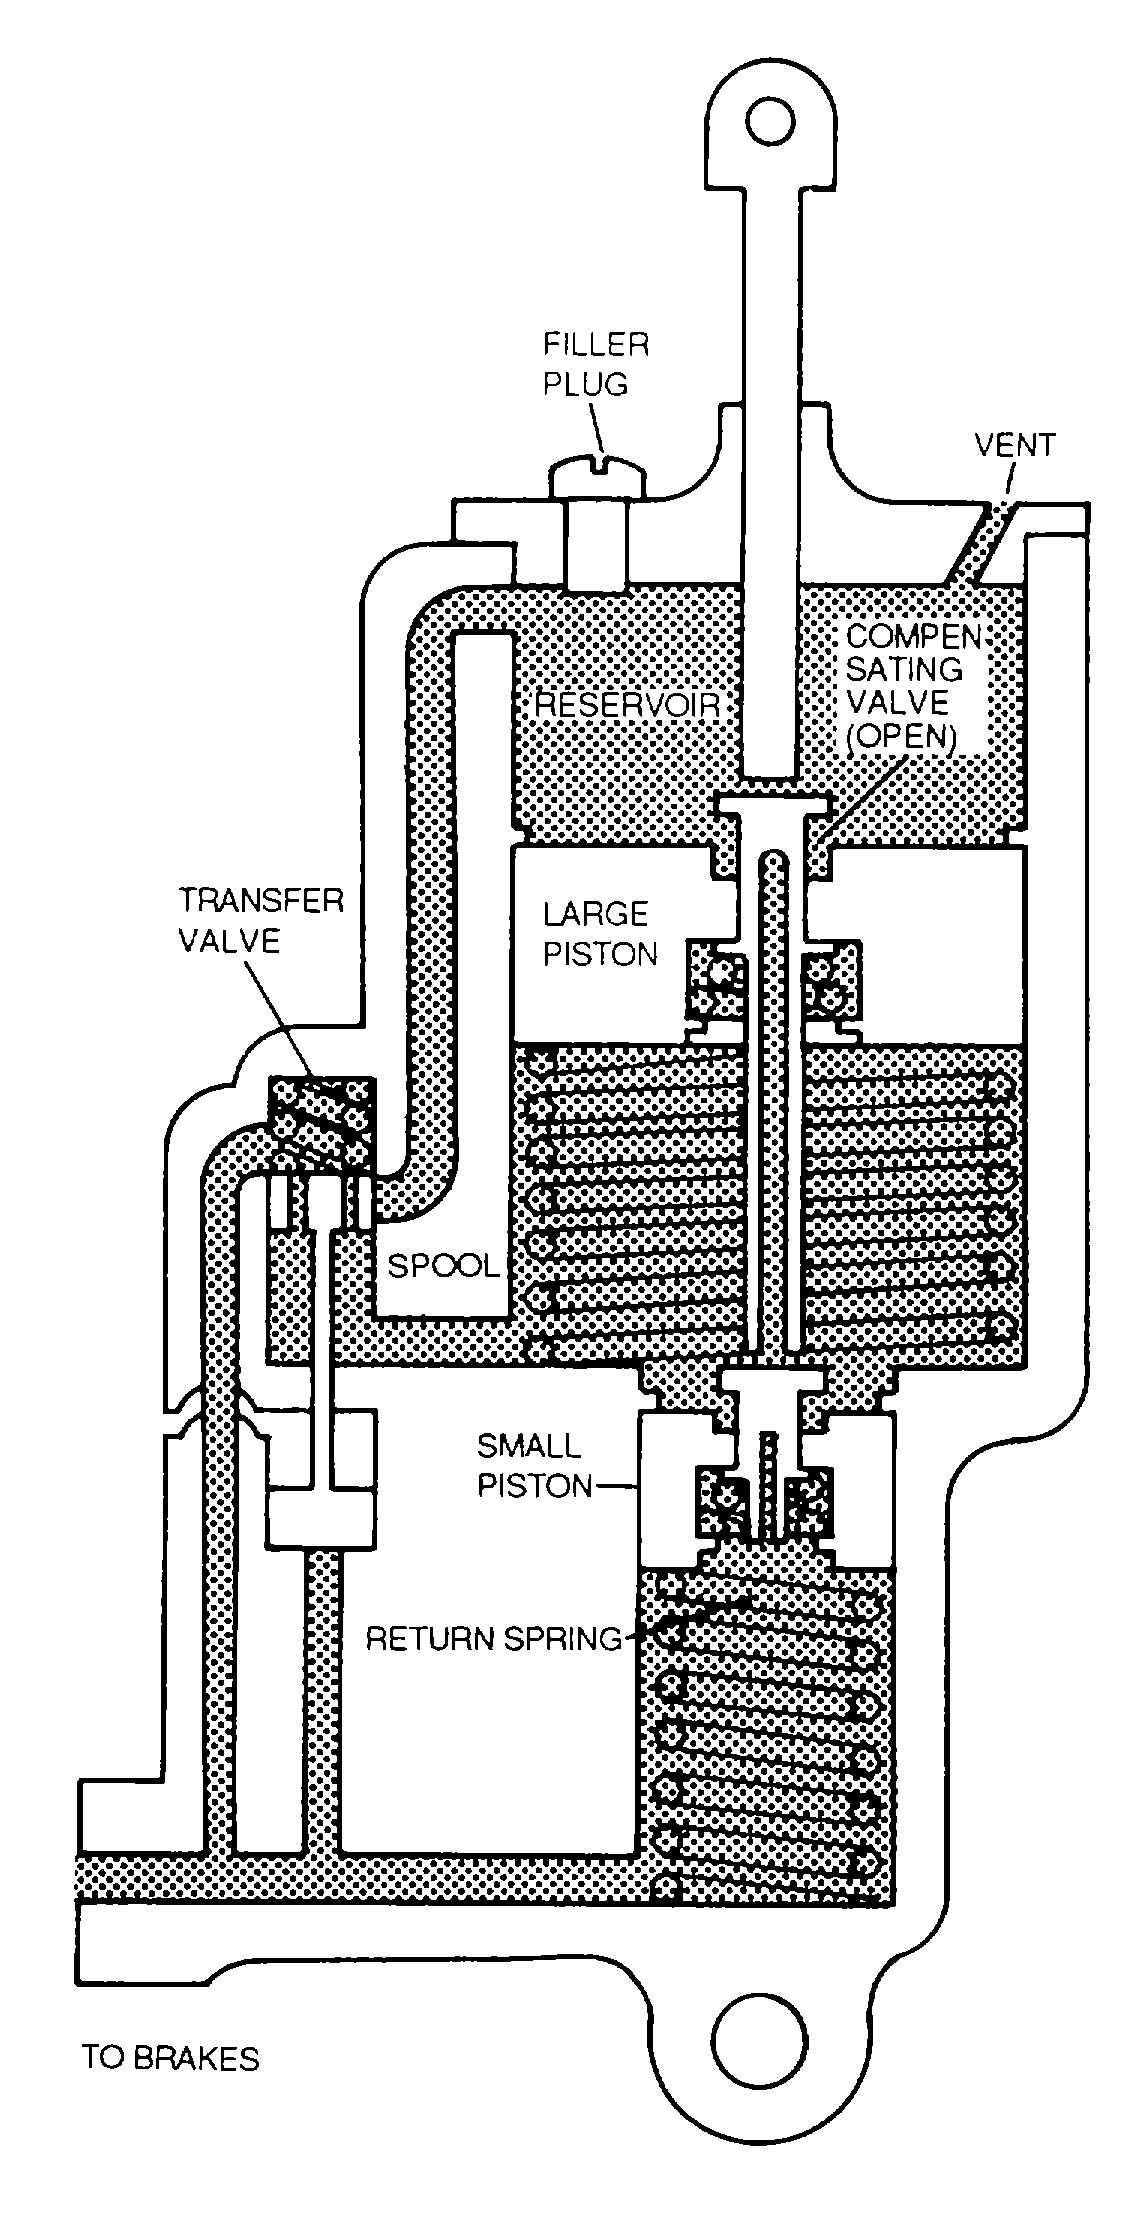 Figure 4-149. Compound Master Cylinder